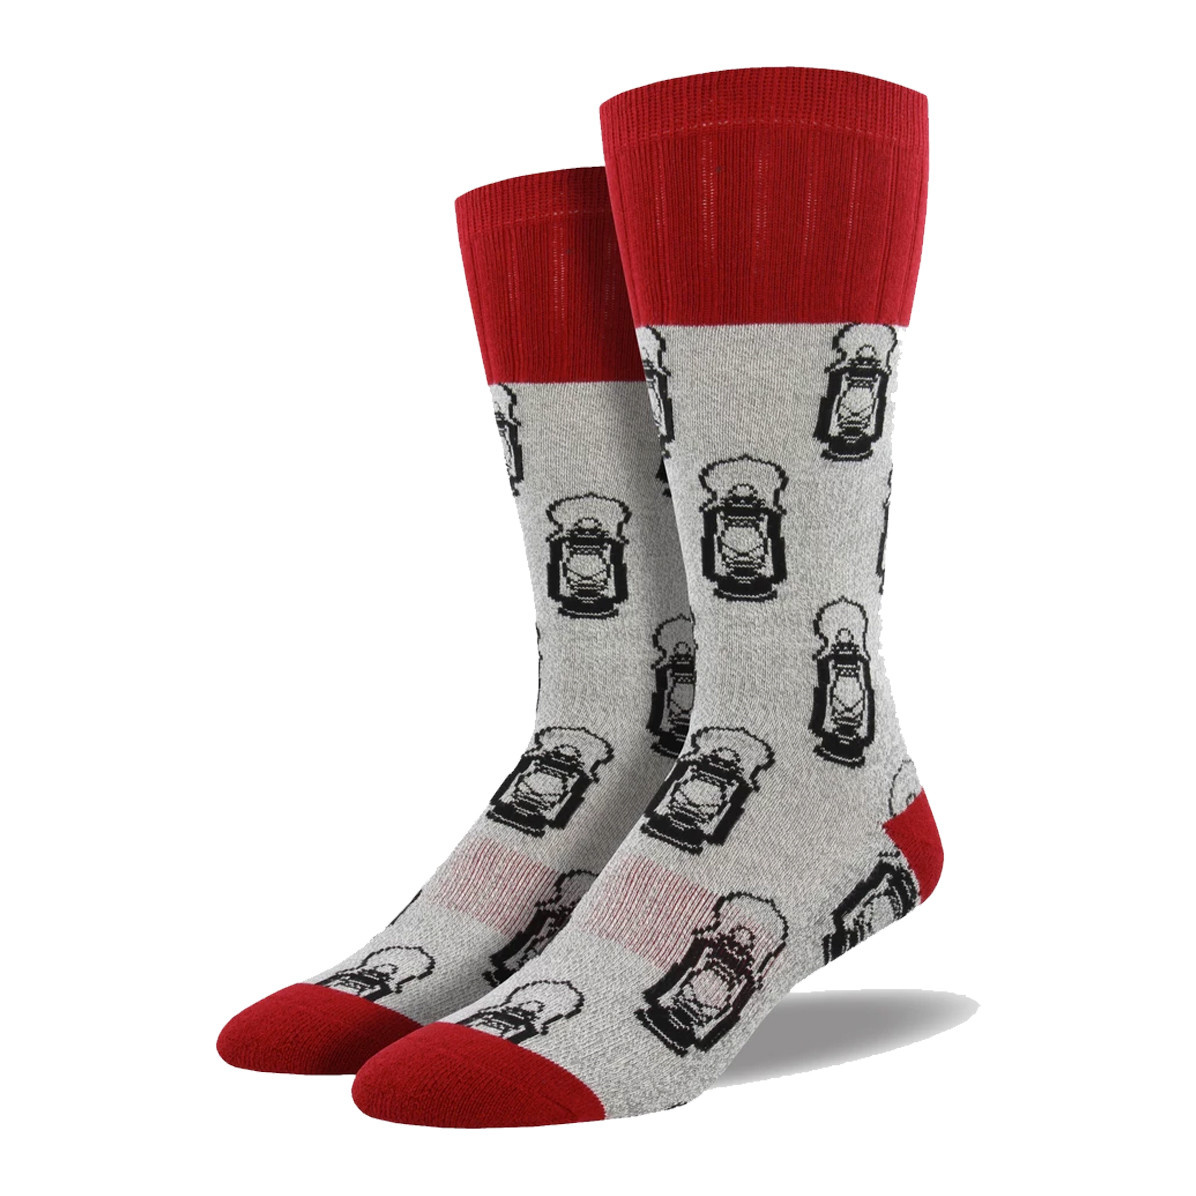 Socksmith Socksmith Men's Boot Socks Lantern Grey